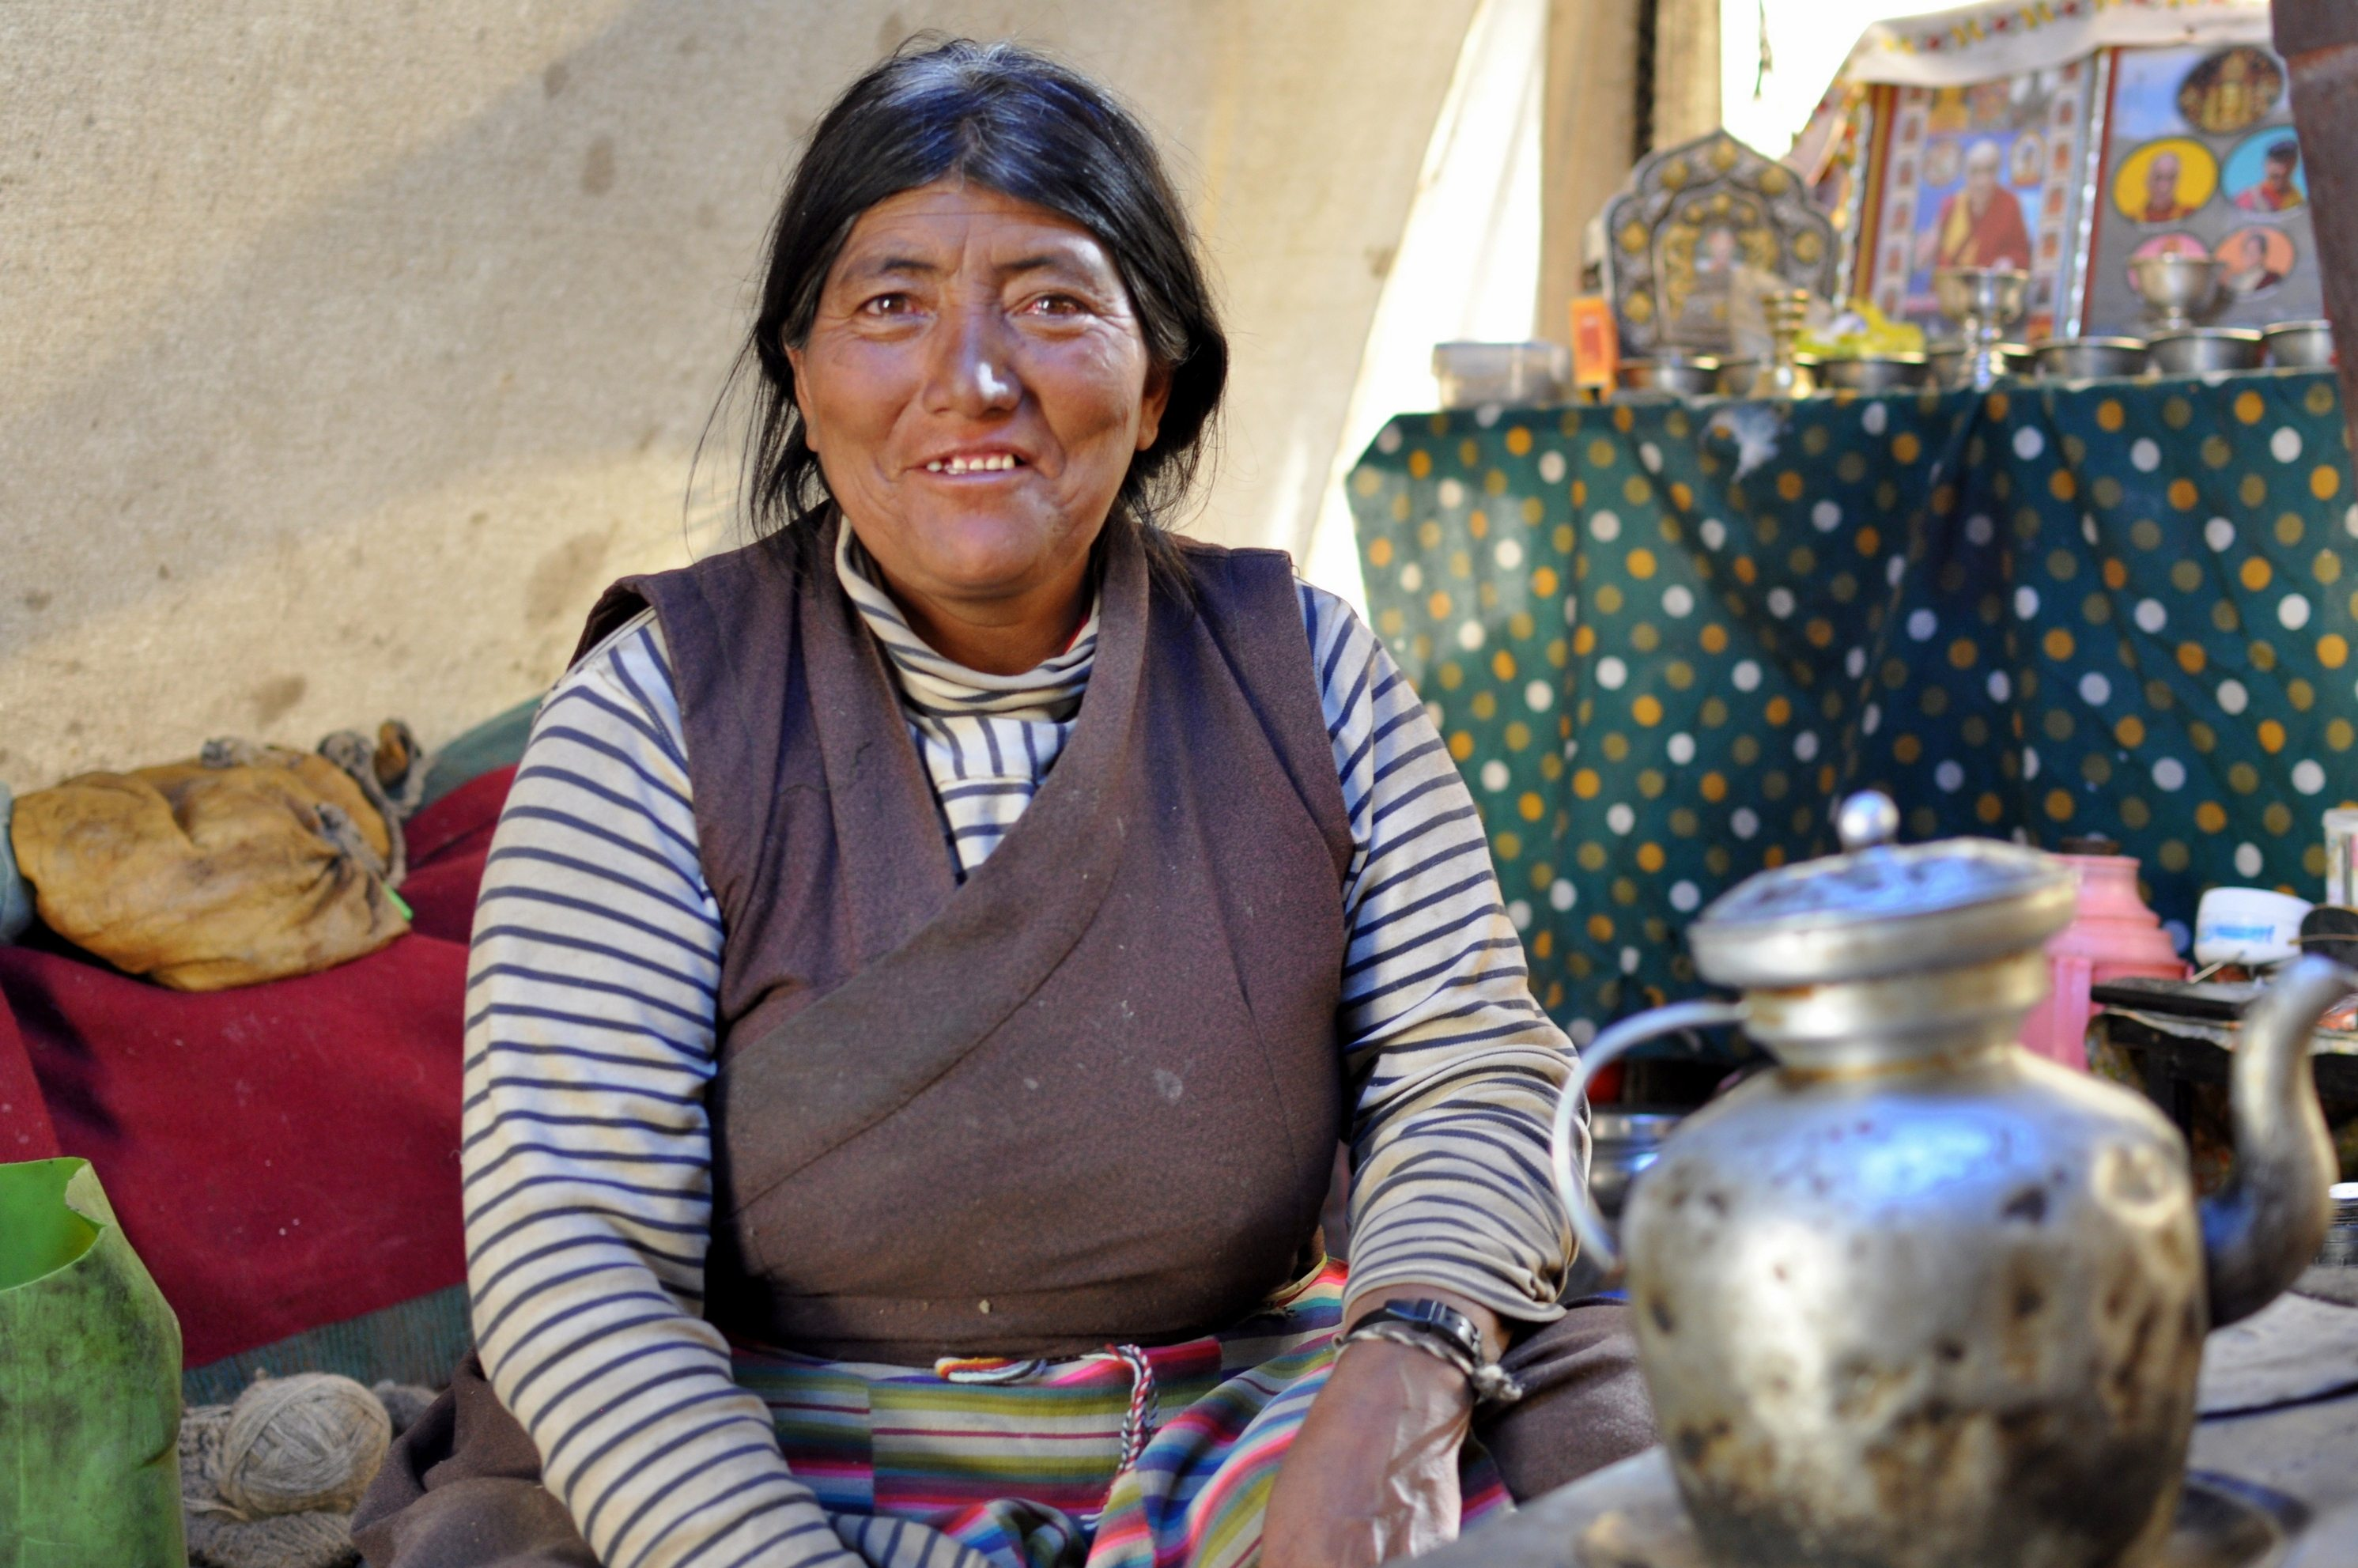 Femme nomade changtangpa, village nomade de Rachung Karu (4850m)